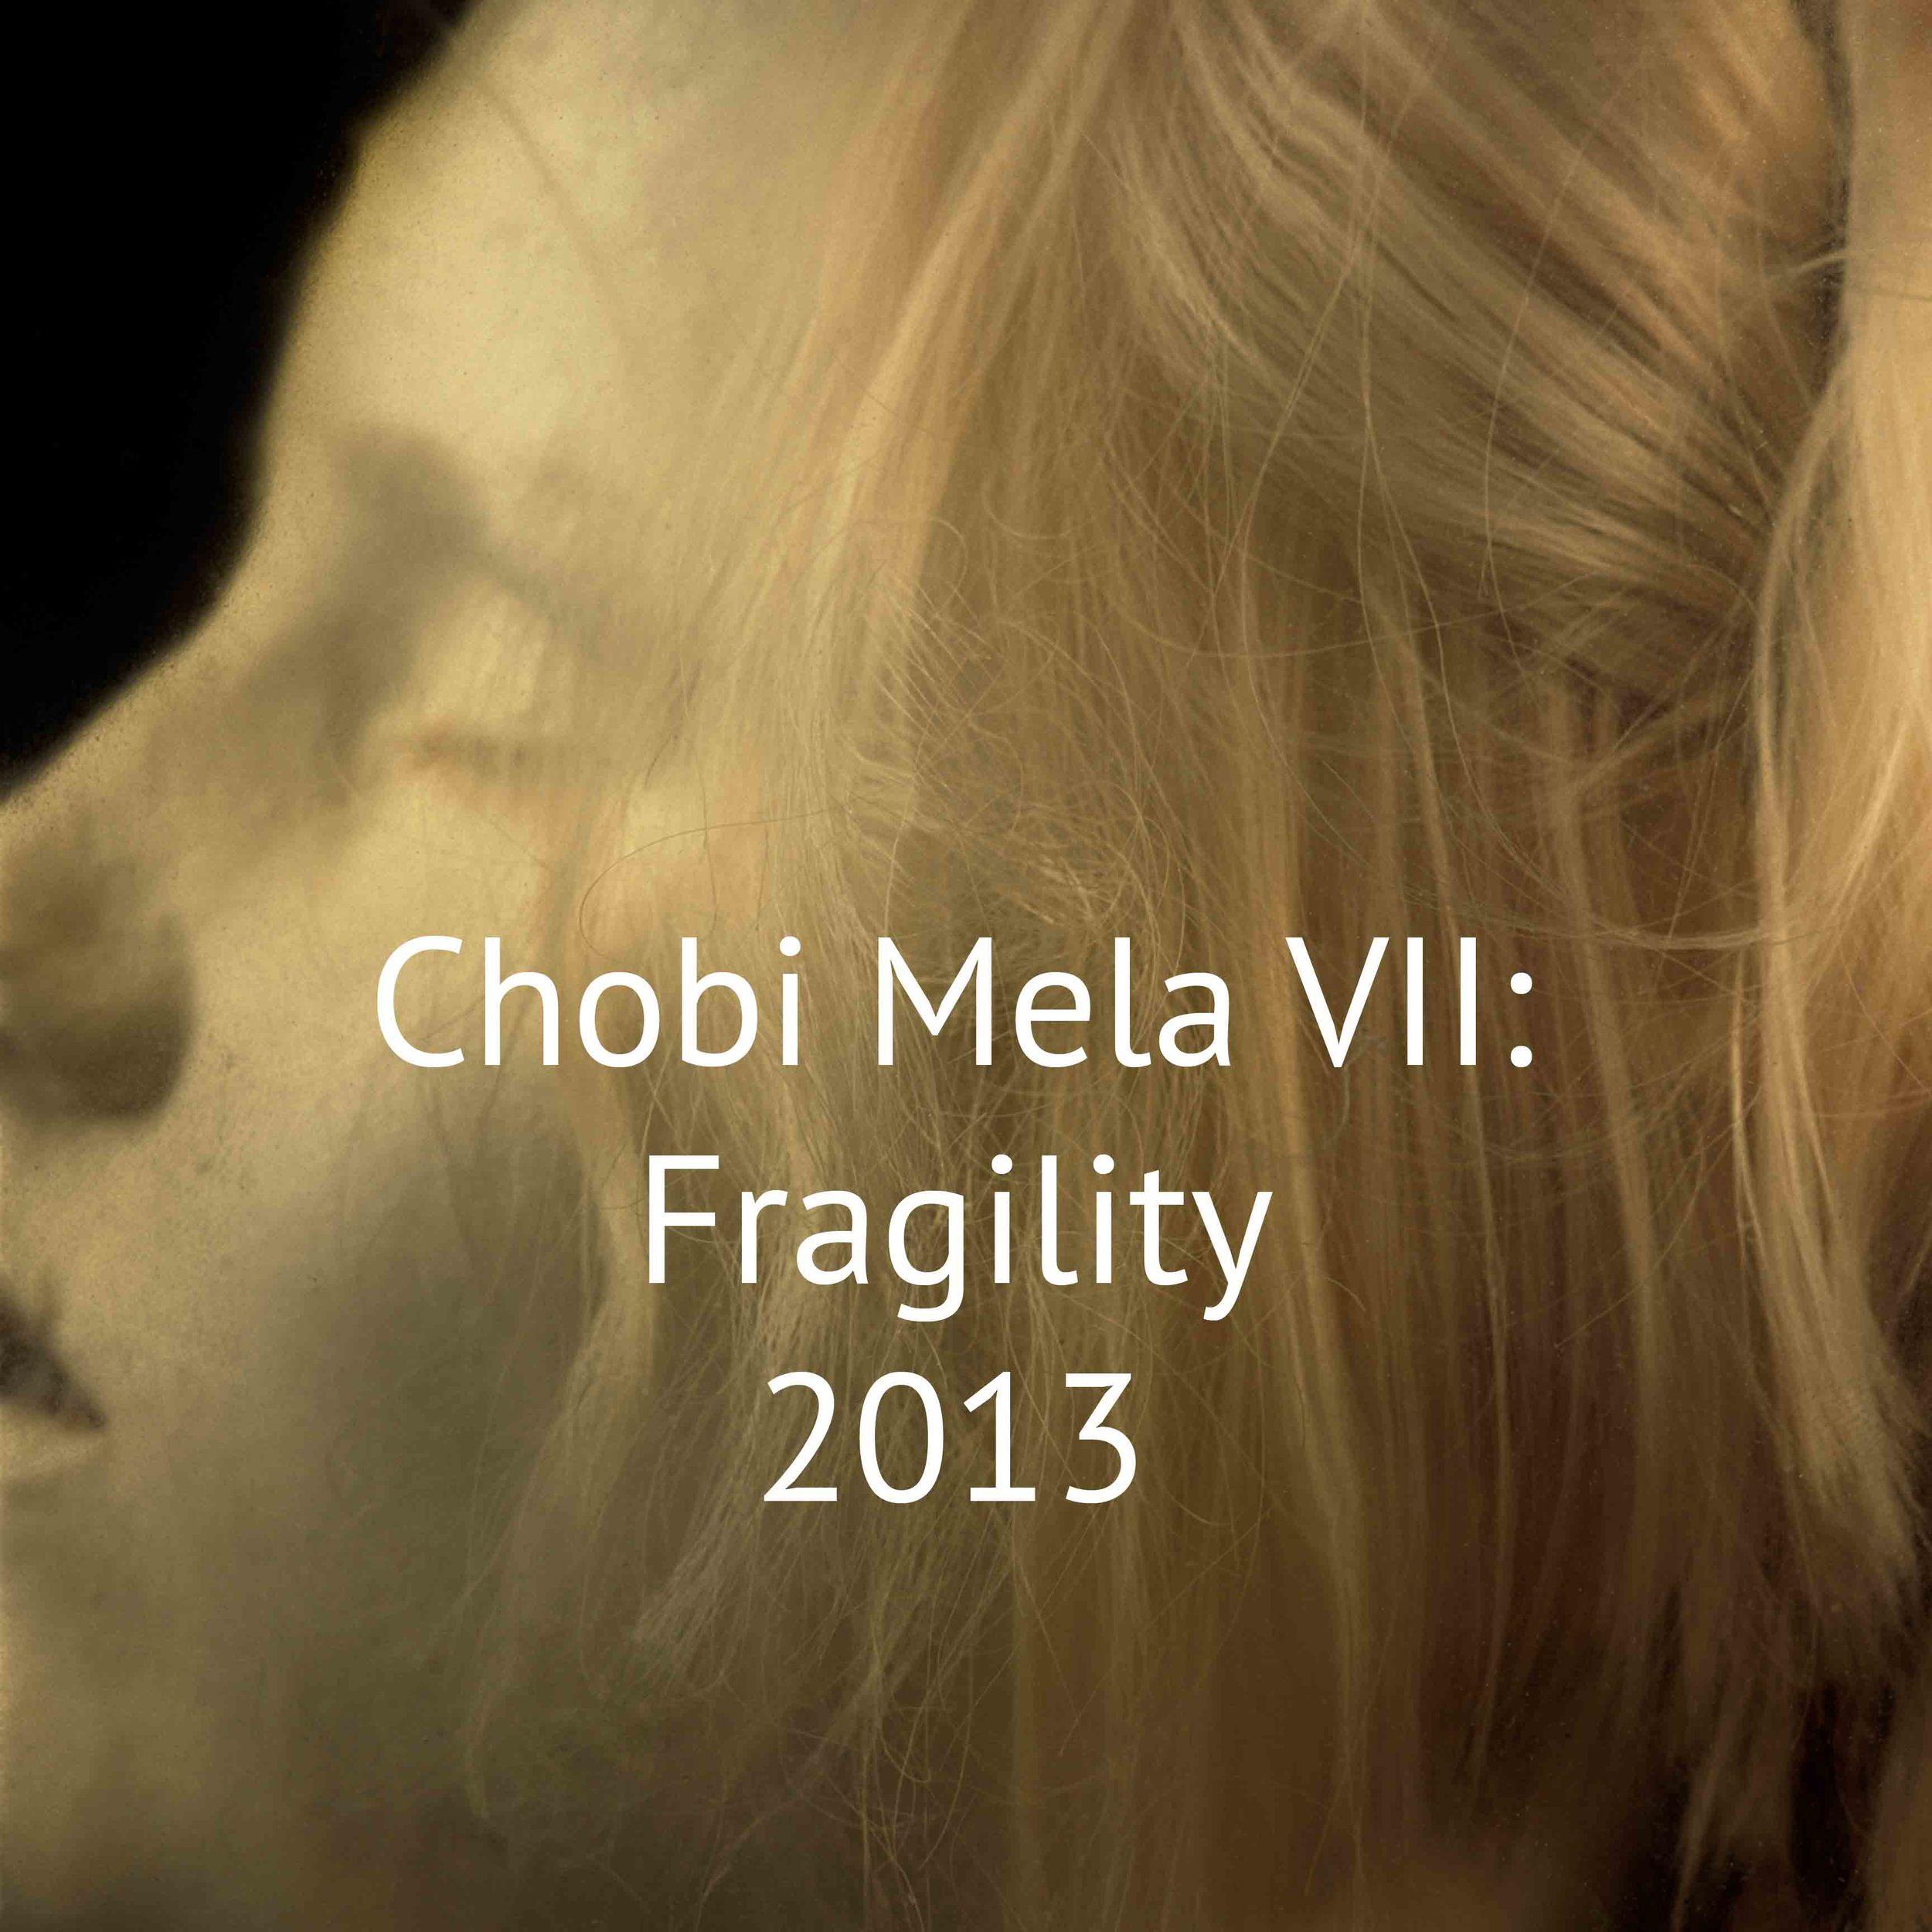 Chobi Mela VII: Fragility